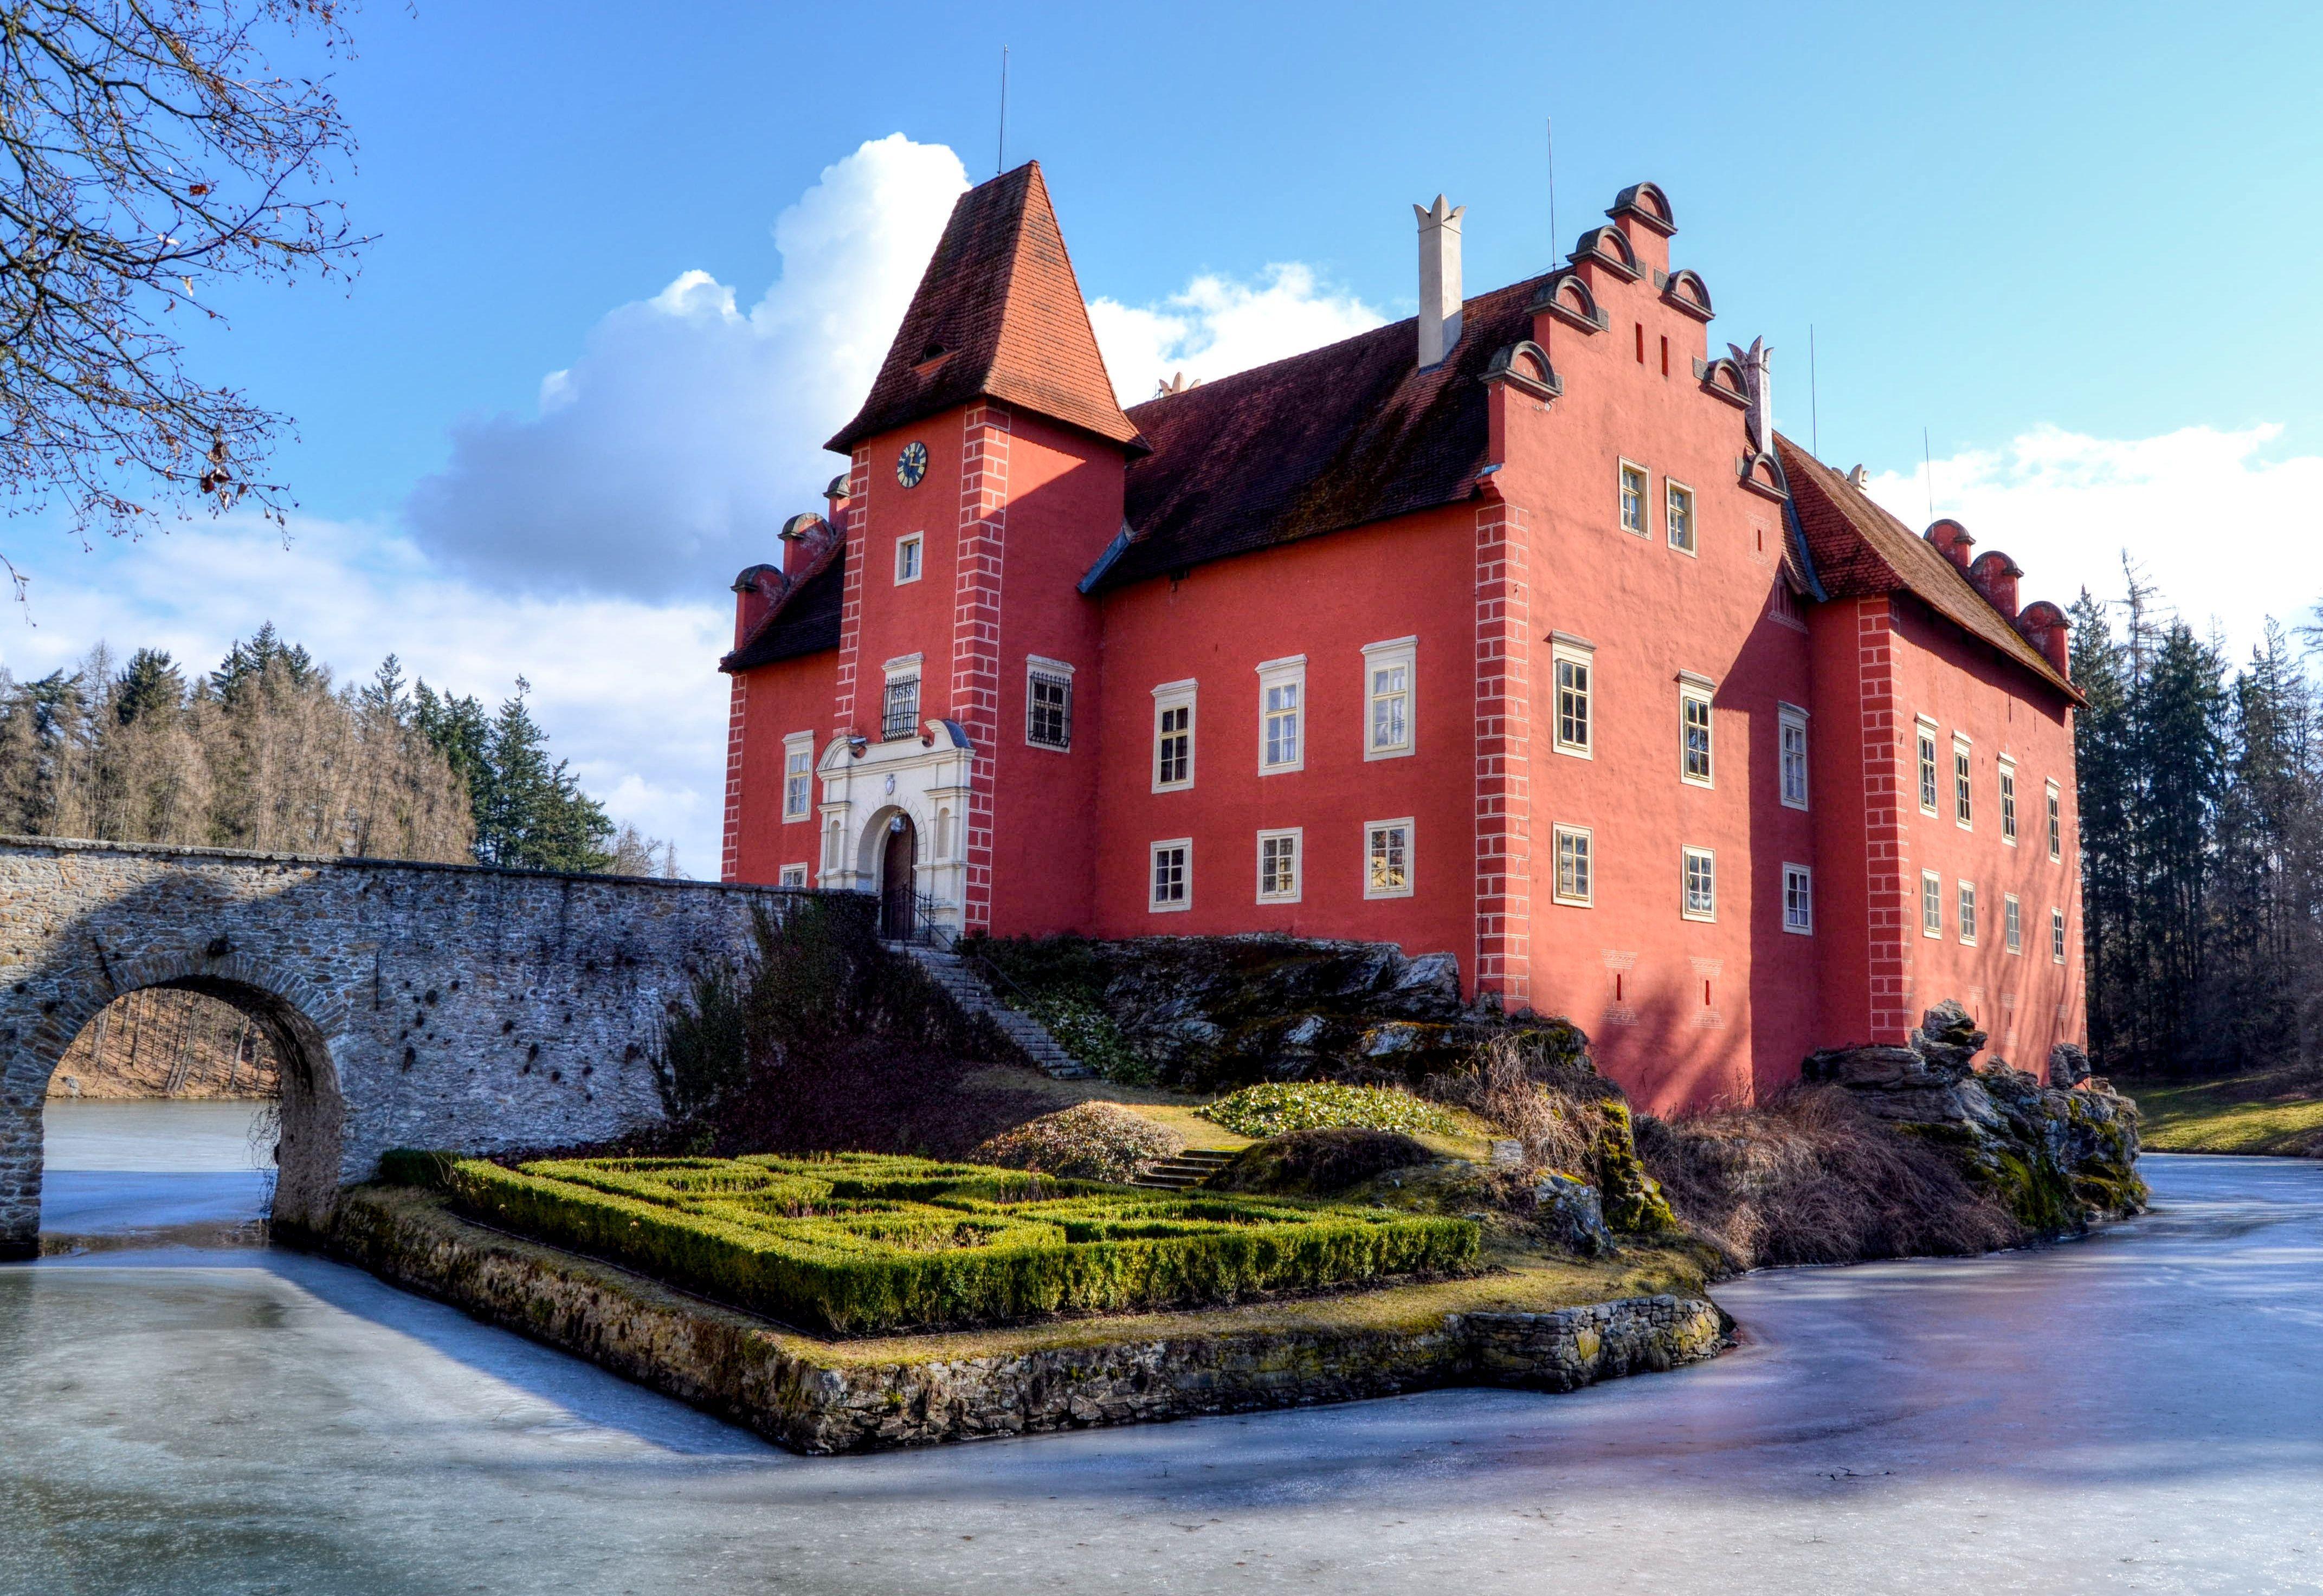 Cervena Lhota Thanks For The Pic Lucka Vrbova Cervenalhota Czech Castle Czechrepublic Czechia Castle Czech Republic